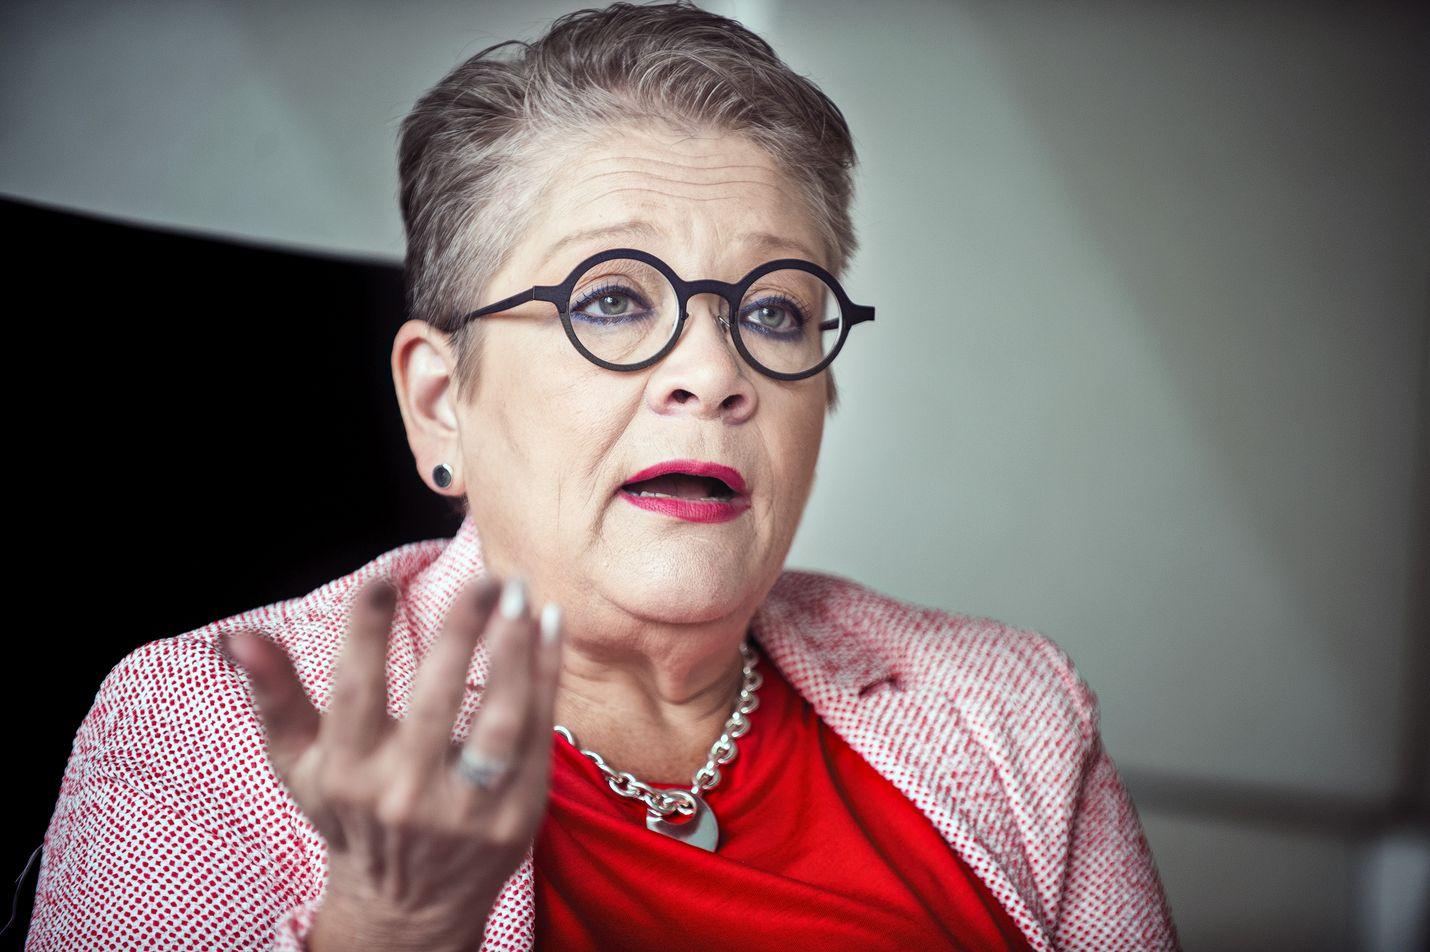 Pam Ylityö